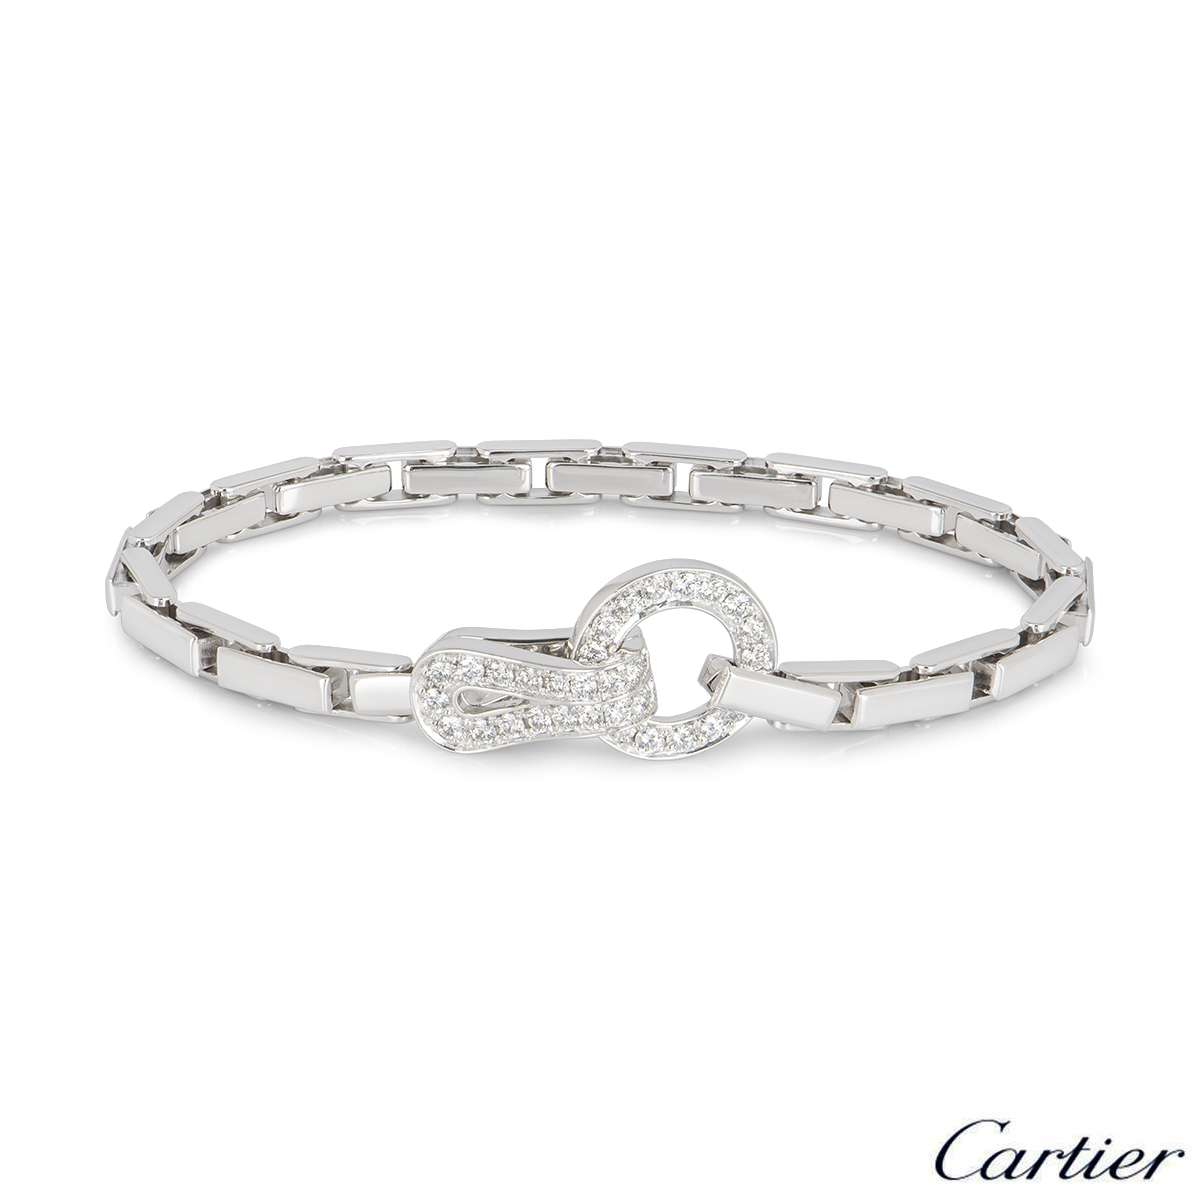 Cartier White Gold Diamond Agrafe Bracelet